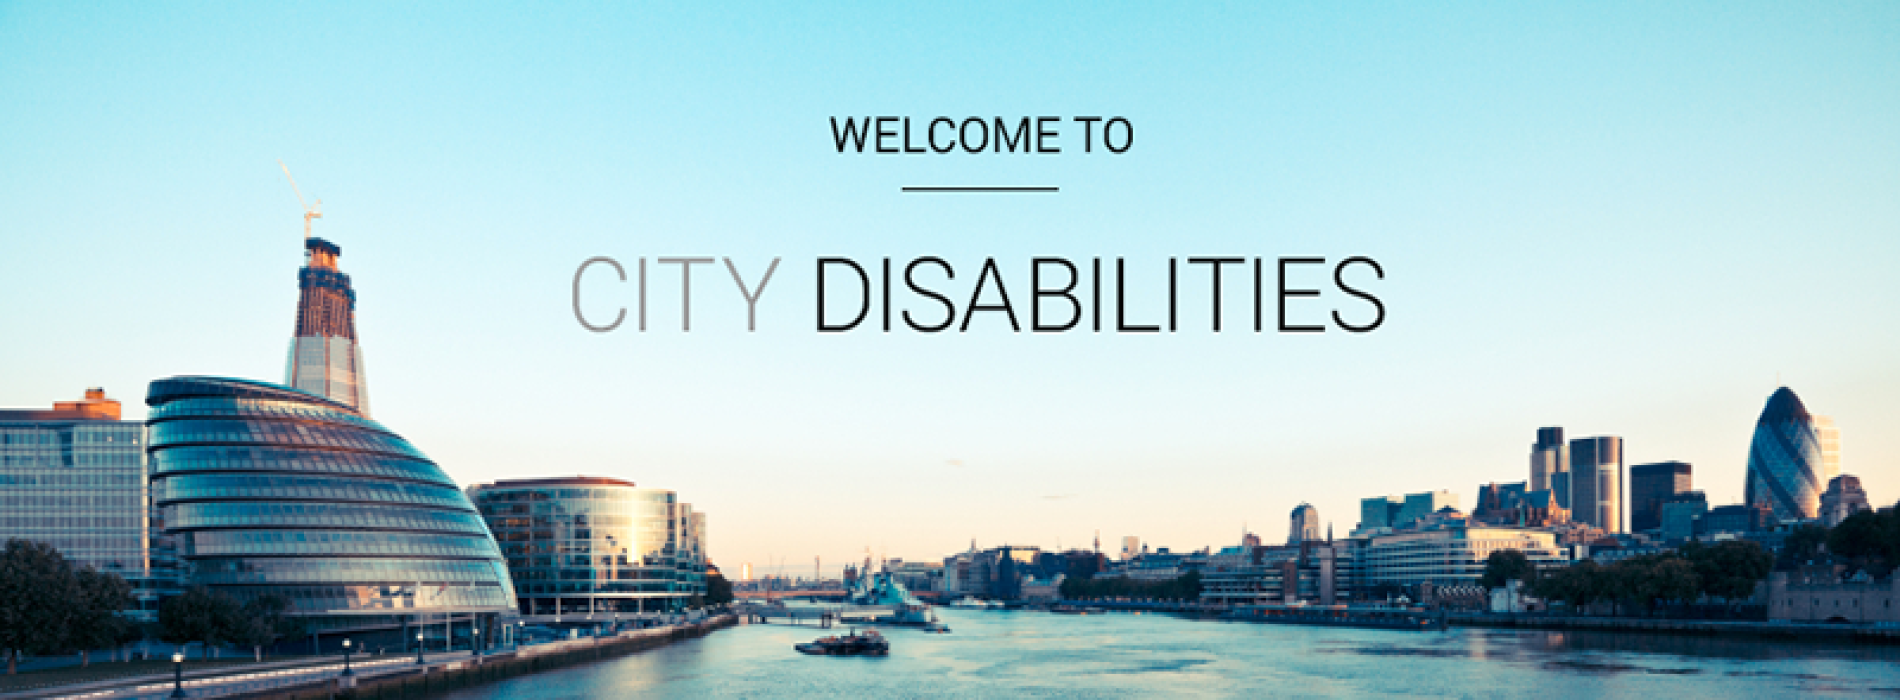 City disabilities: building a career